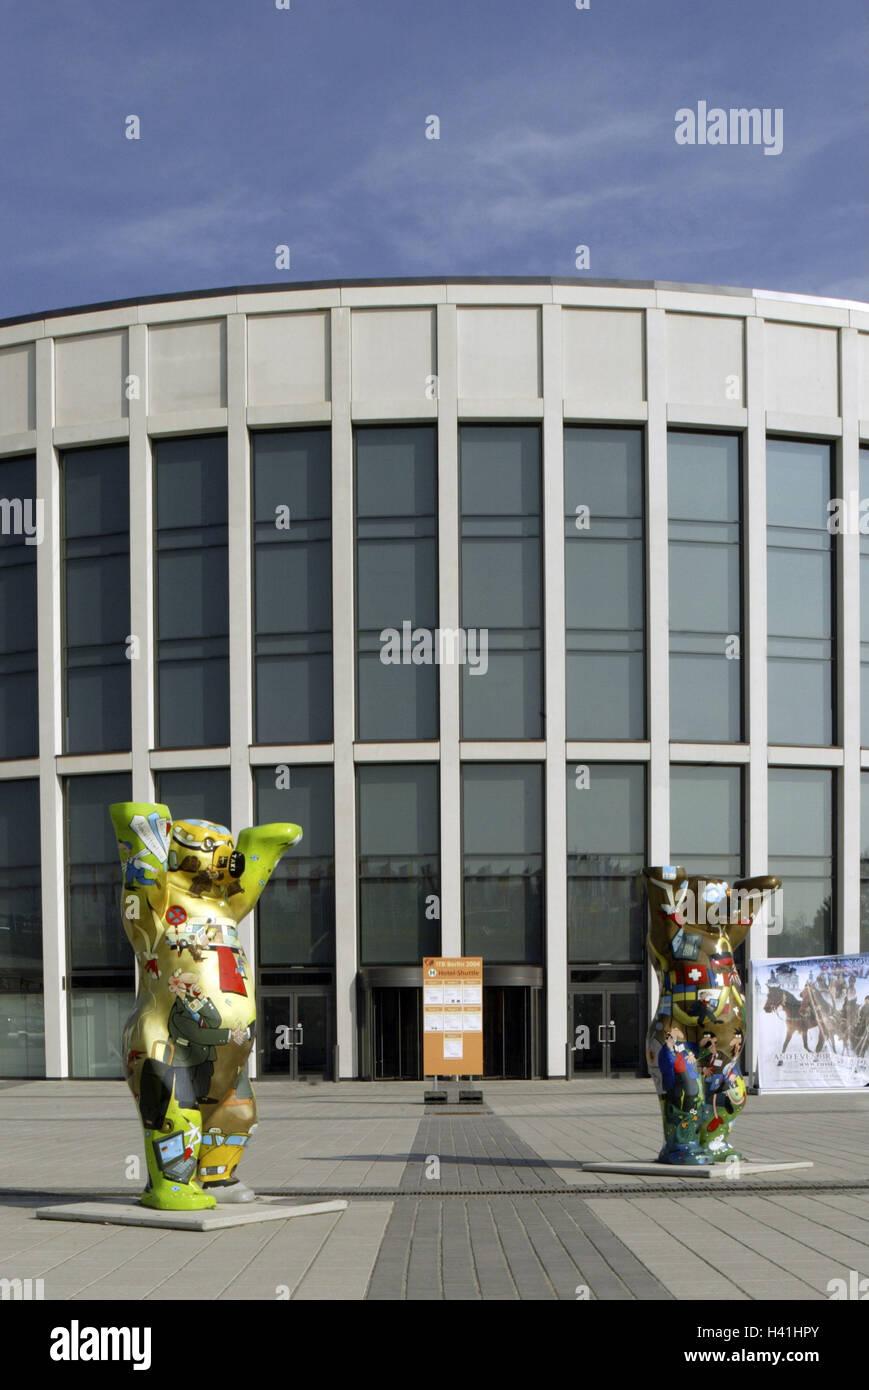 Germany, Berlin, exhibition site, Buddy Bären '# 018 + # 019, Europe, town, capital, international Congress centrum, Stock Photo